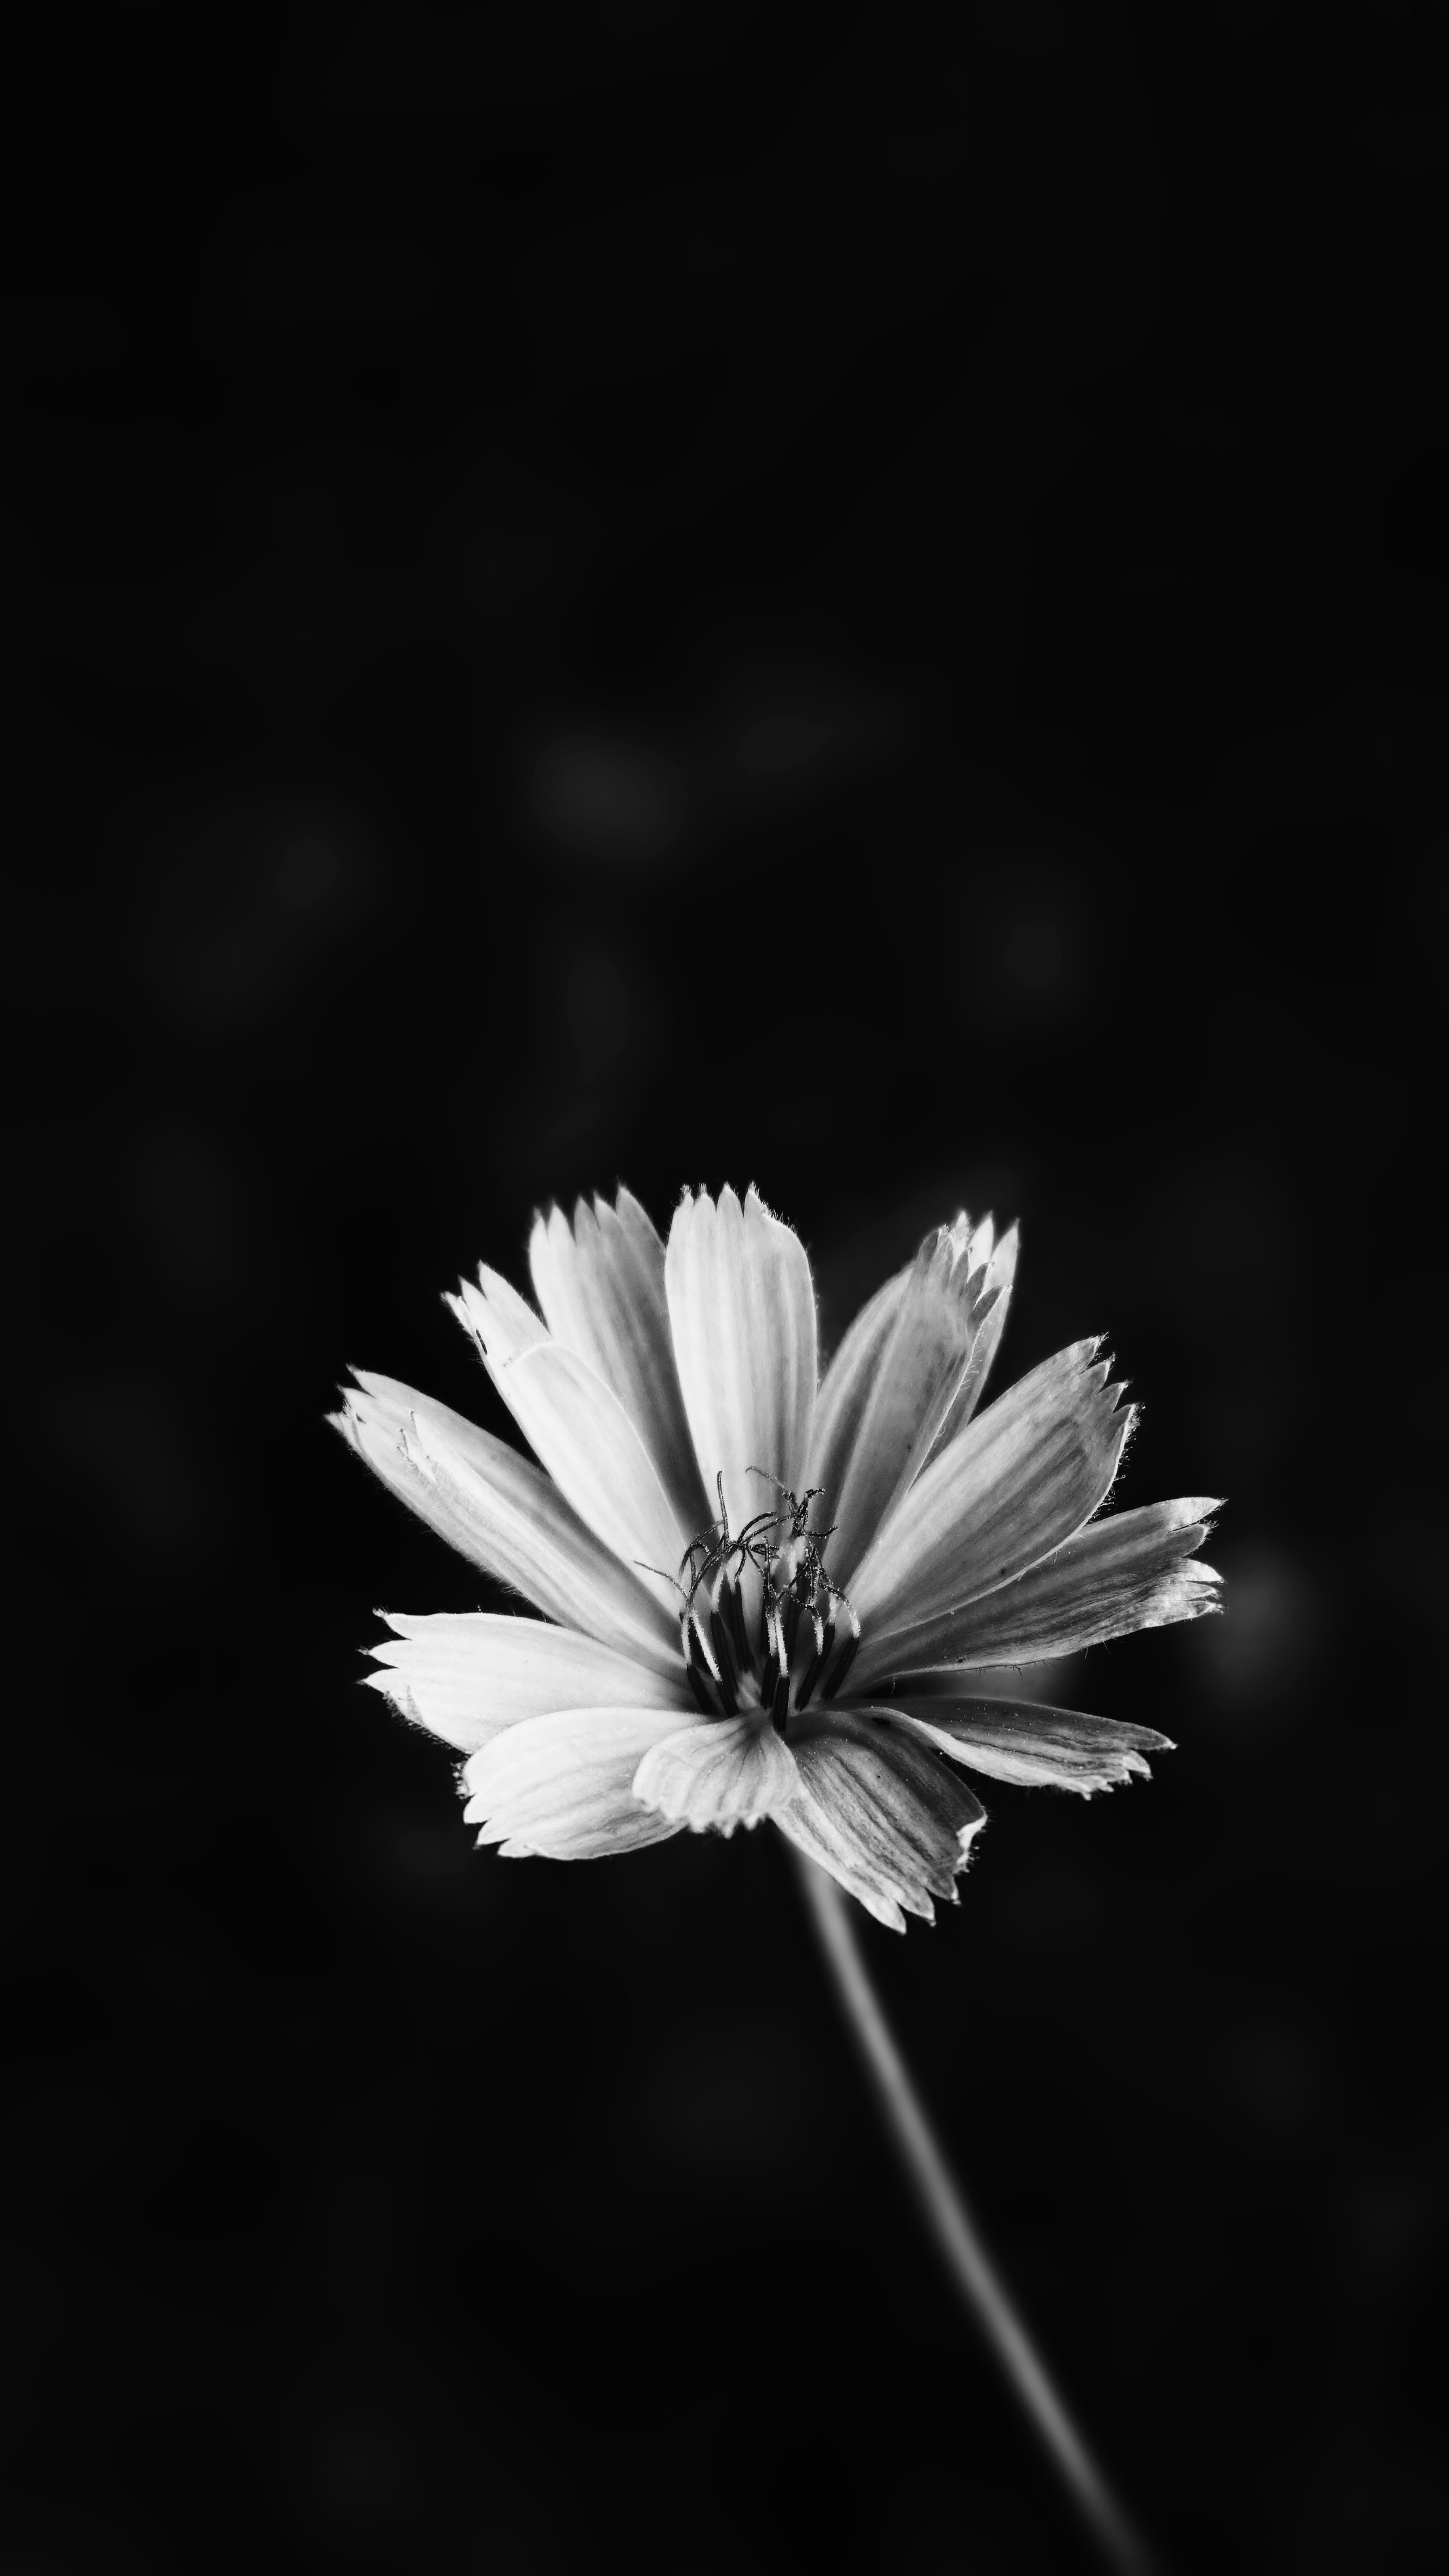 Free Stock Photo Of Beautiful Flower Lockscreen Wallpaper